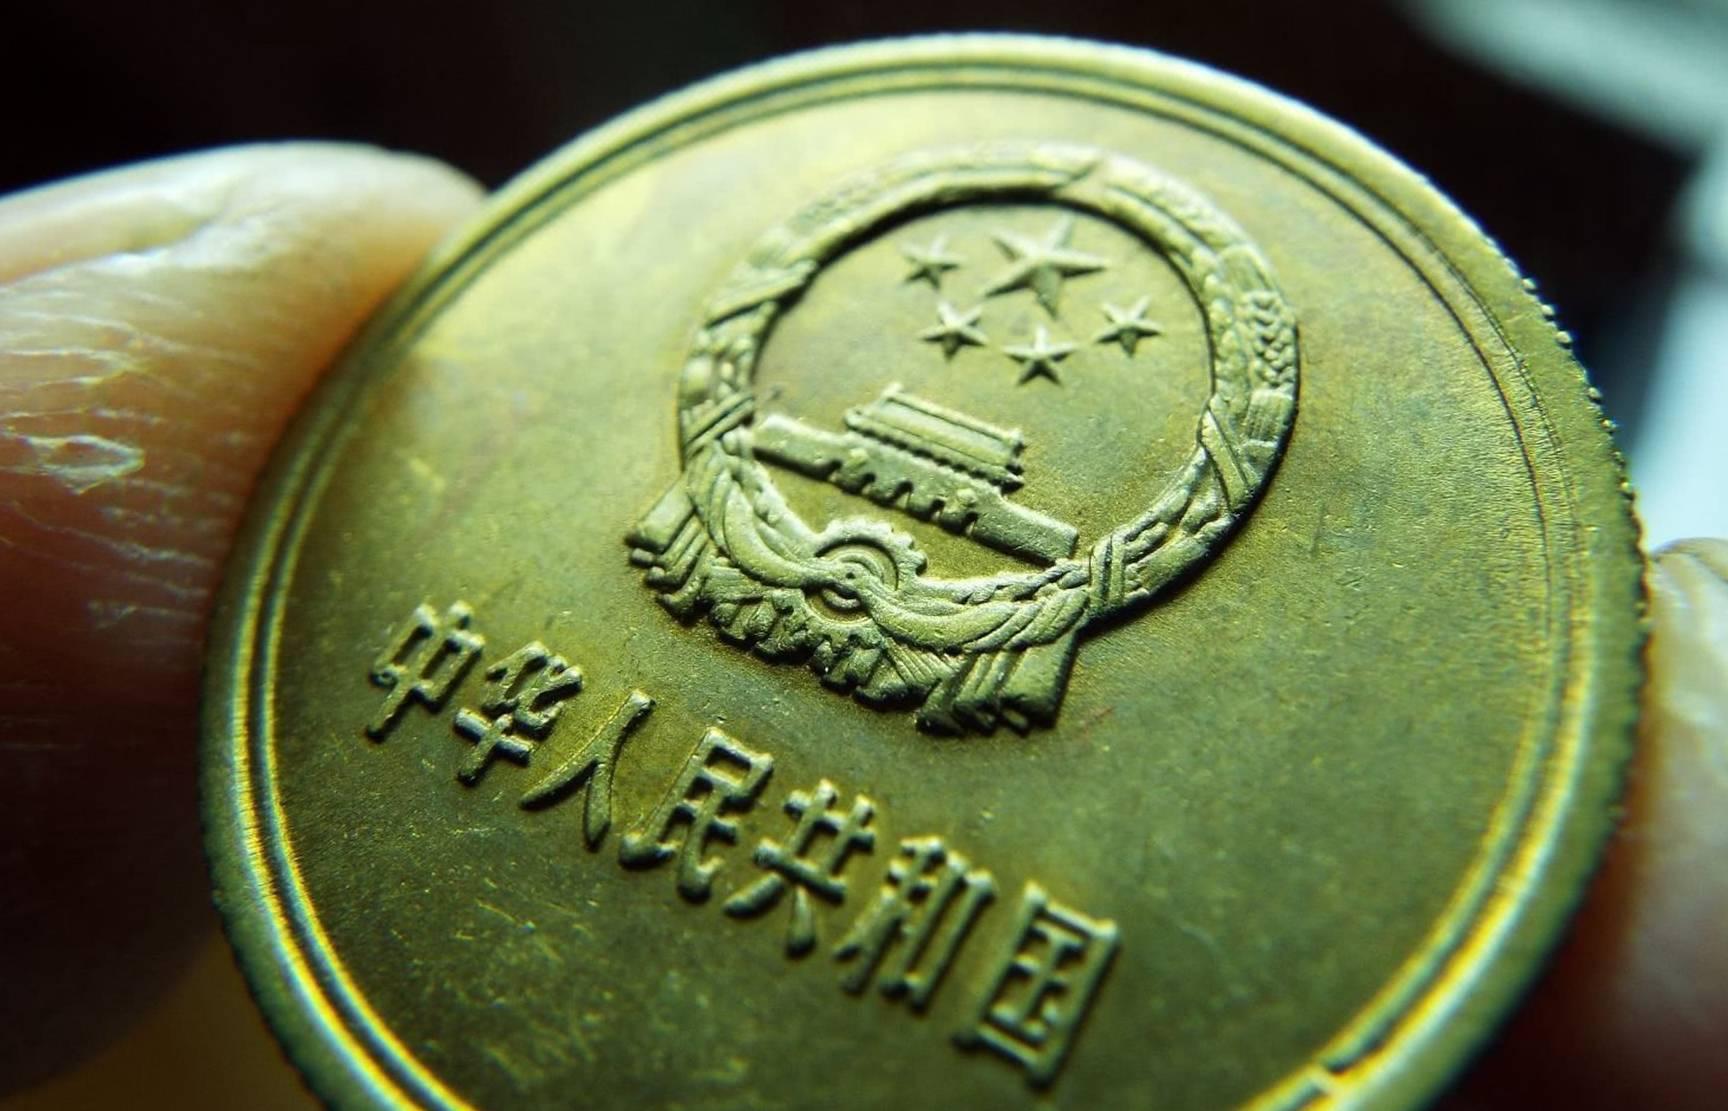 2分硬币9万1962年